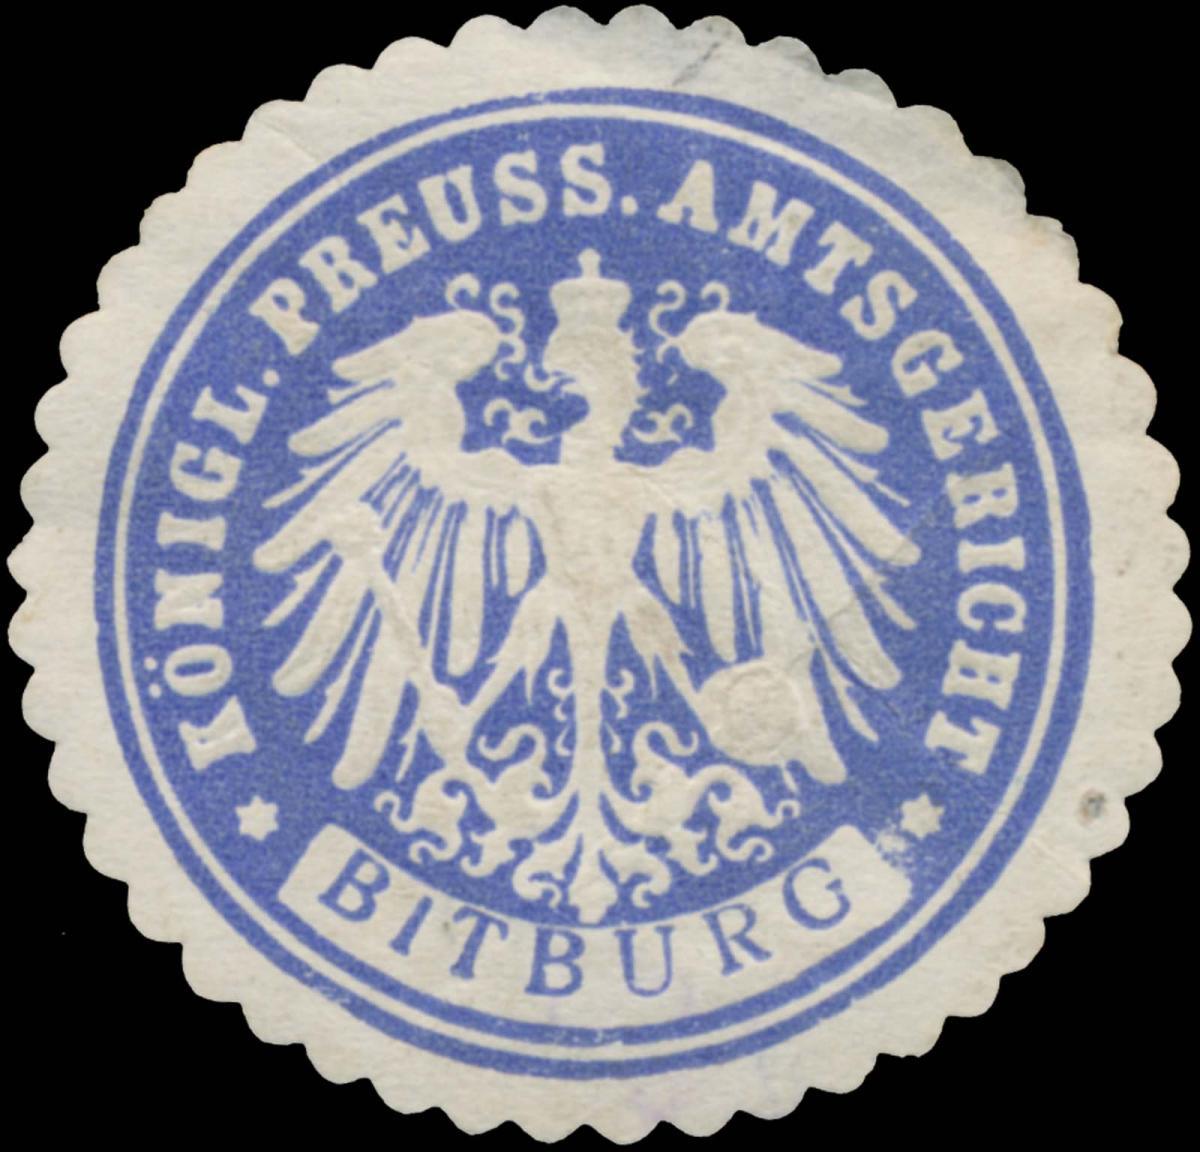 K.Pr. Amtsgericht Bitburg